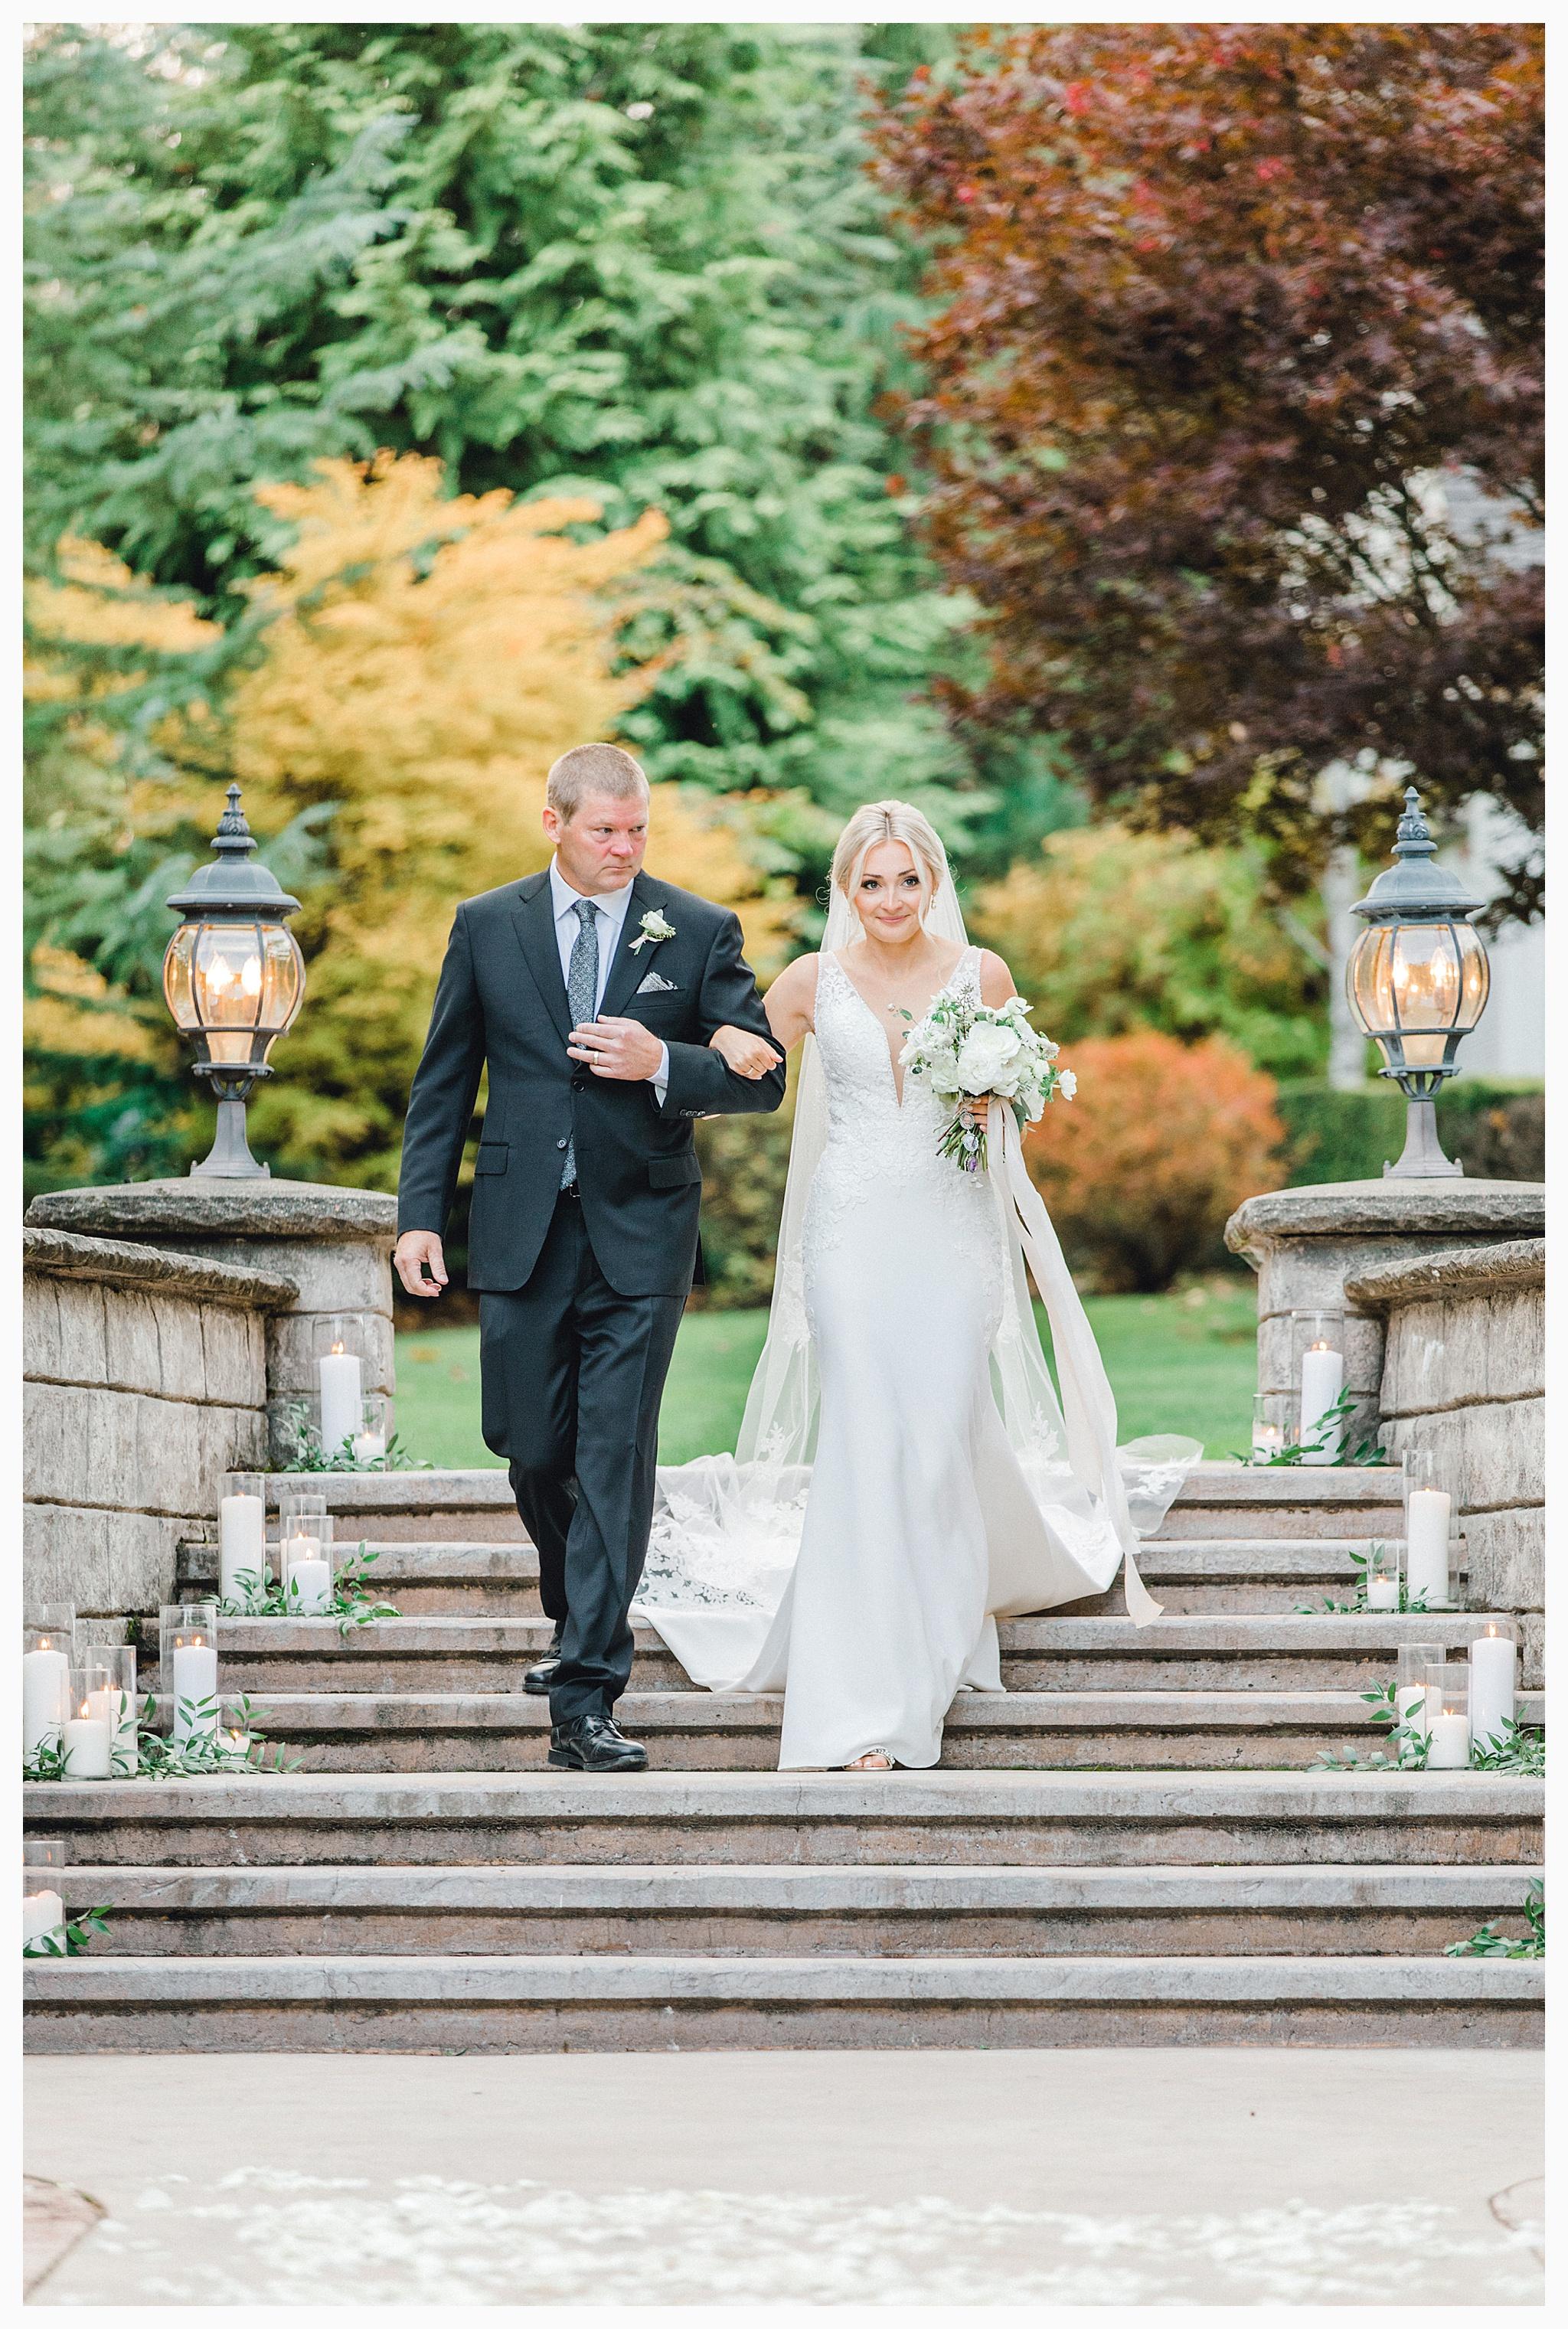 Emma Rose Company Light and Airy Wedding Photographer, Beautiful fall wedding at Rock Creek Gardens Venue in Puyallup, Washington._0074.jpg